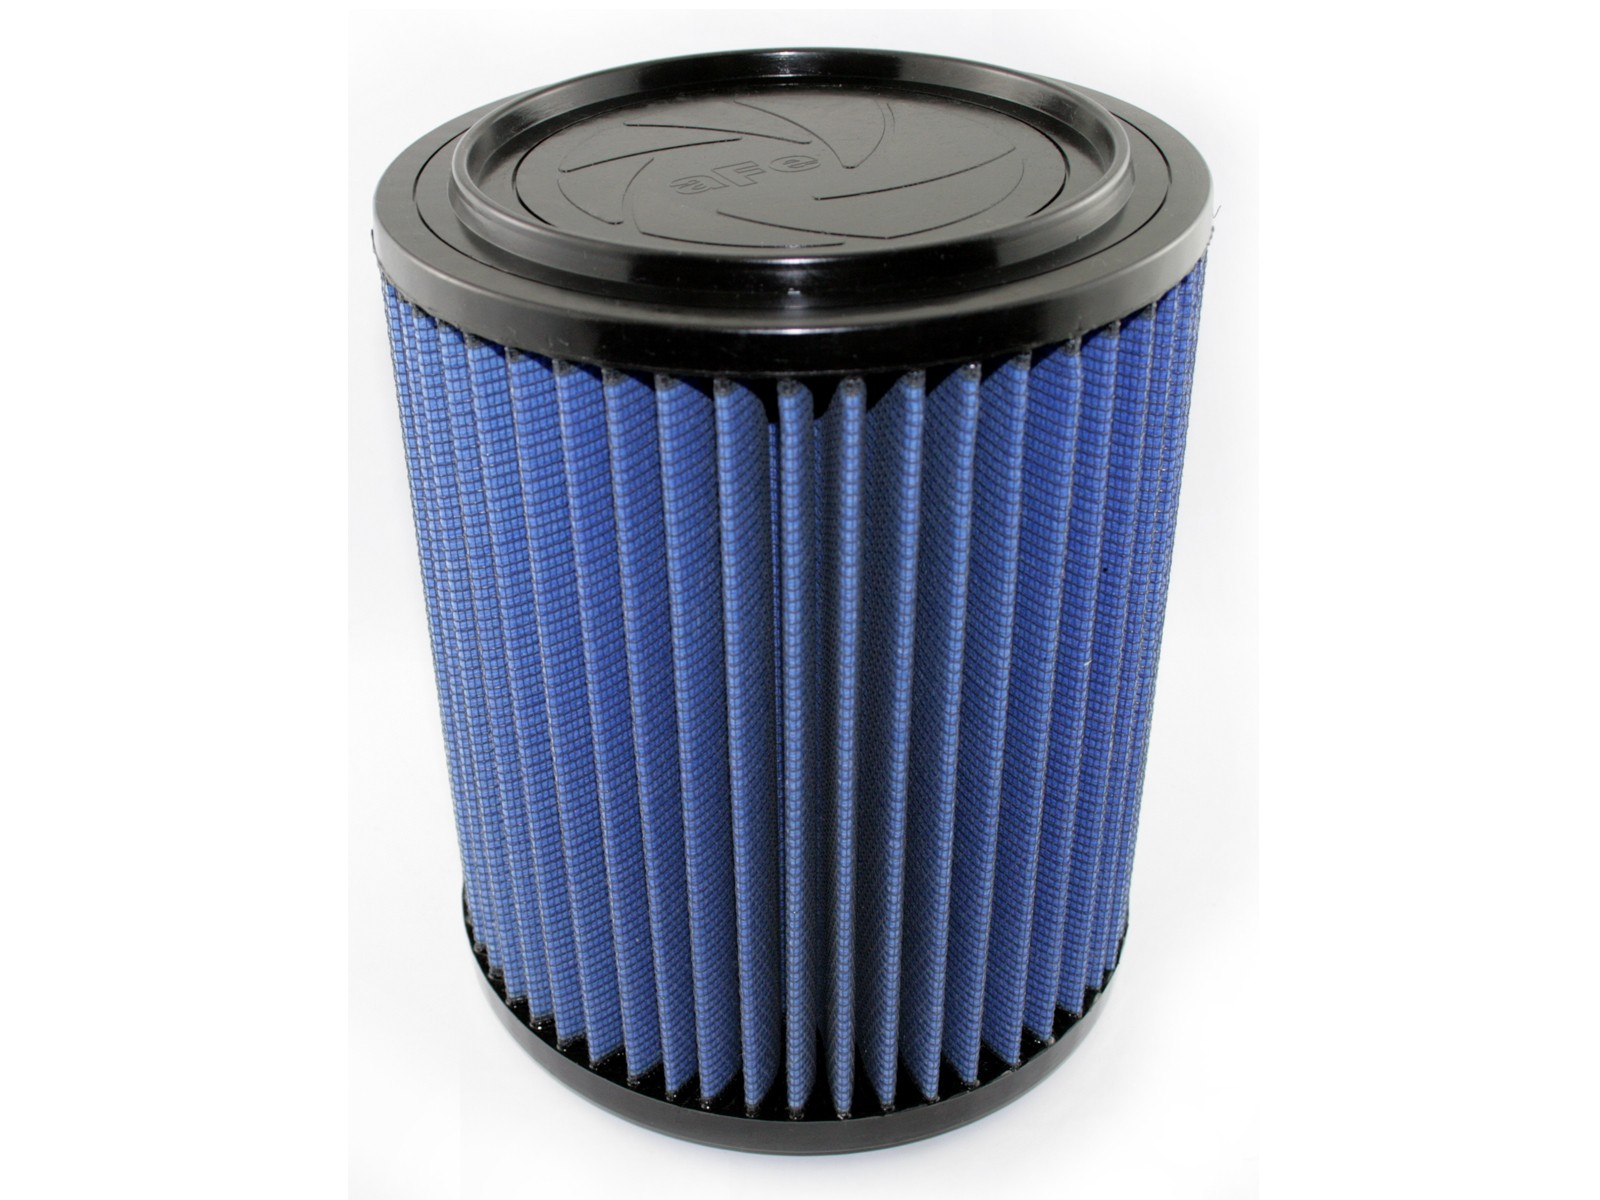 aFe POWER 10-10030 Magnum FLOW Pro 5R Air Filter